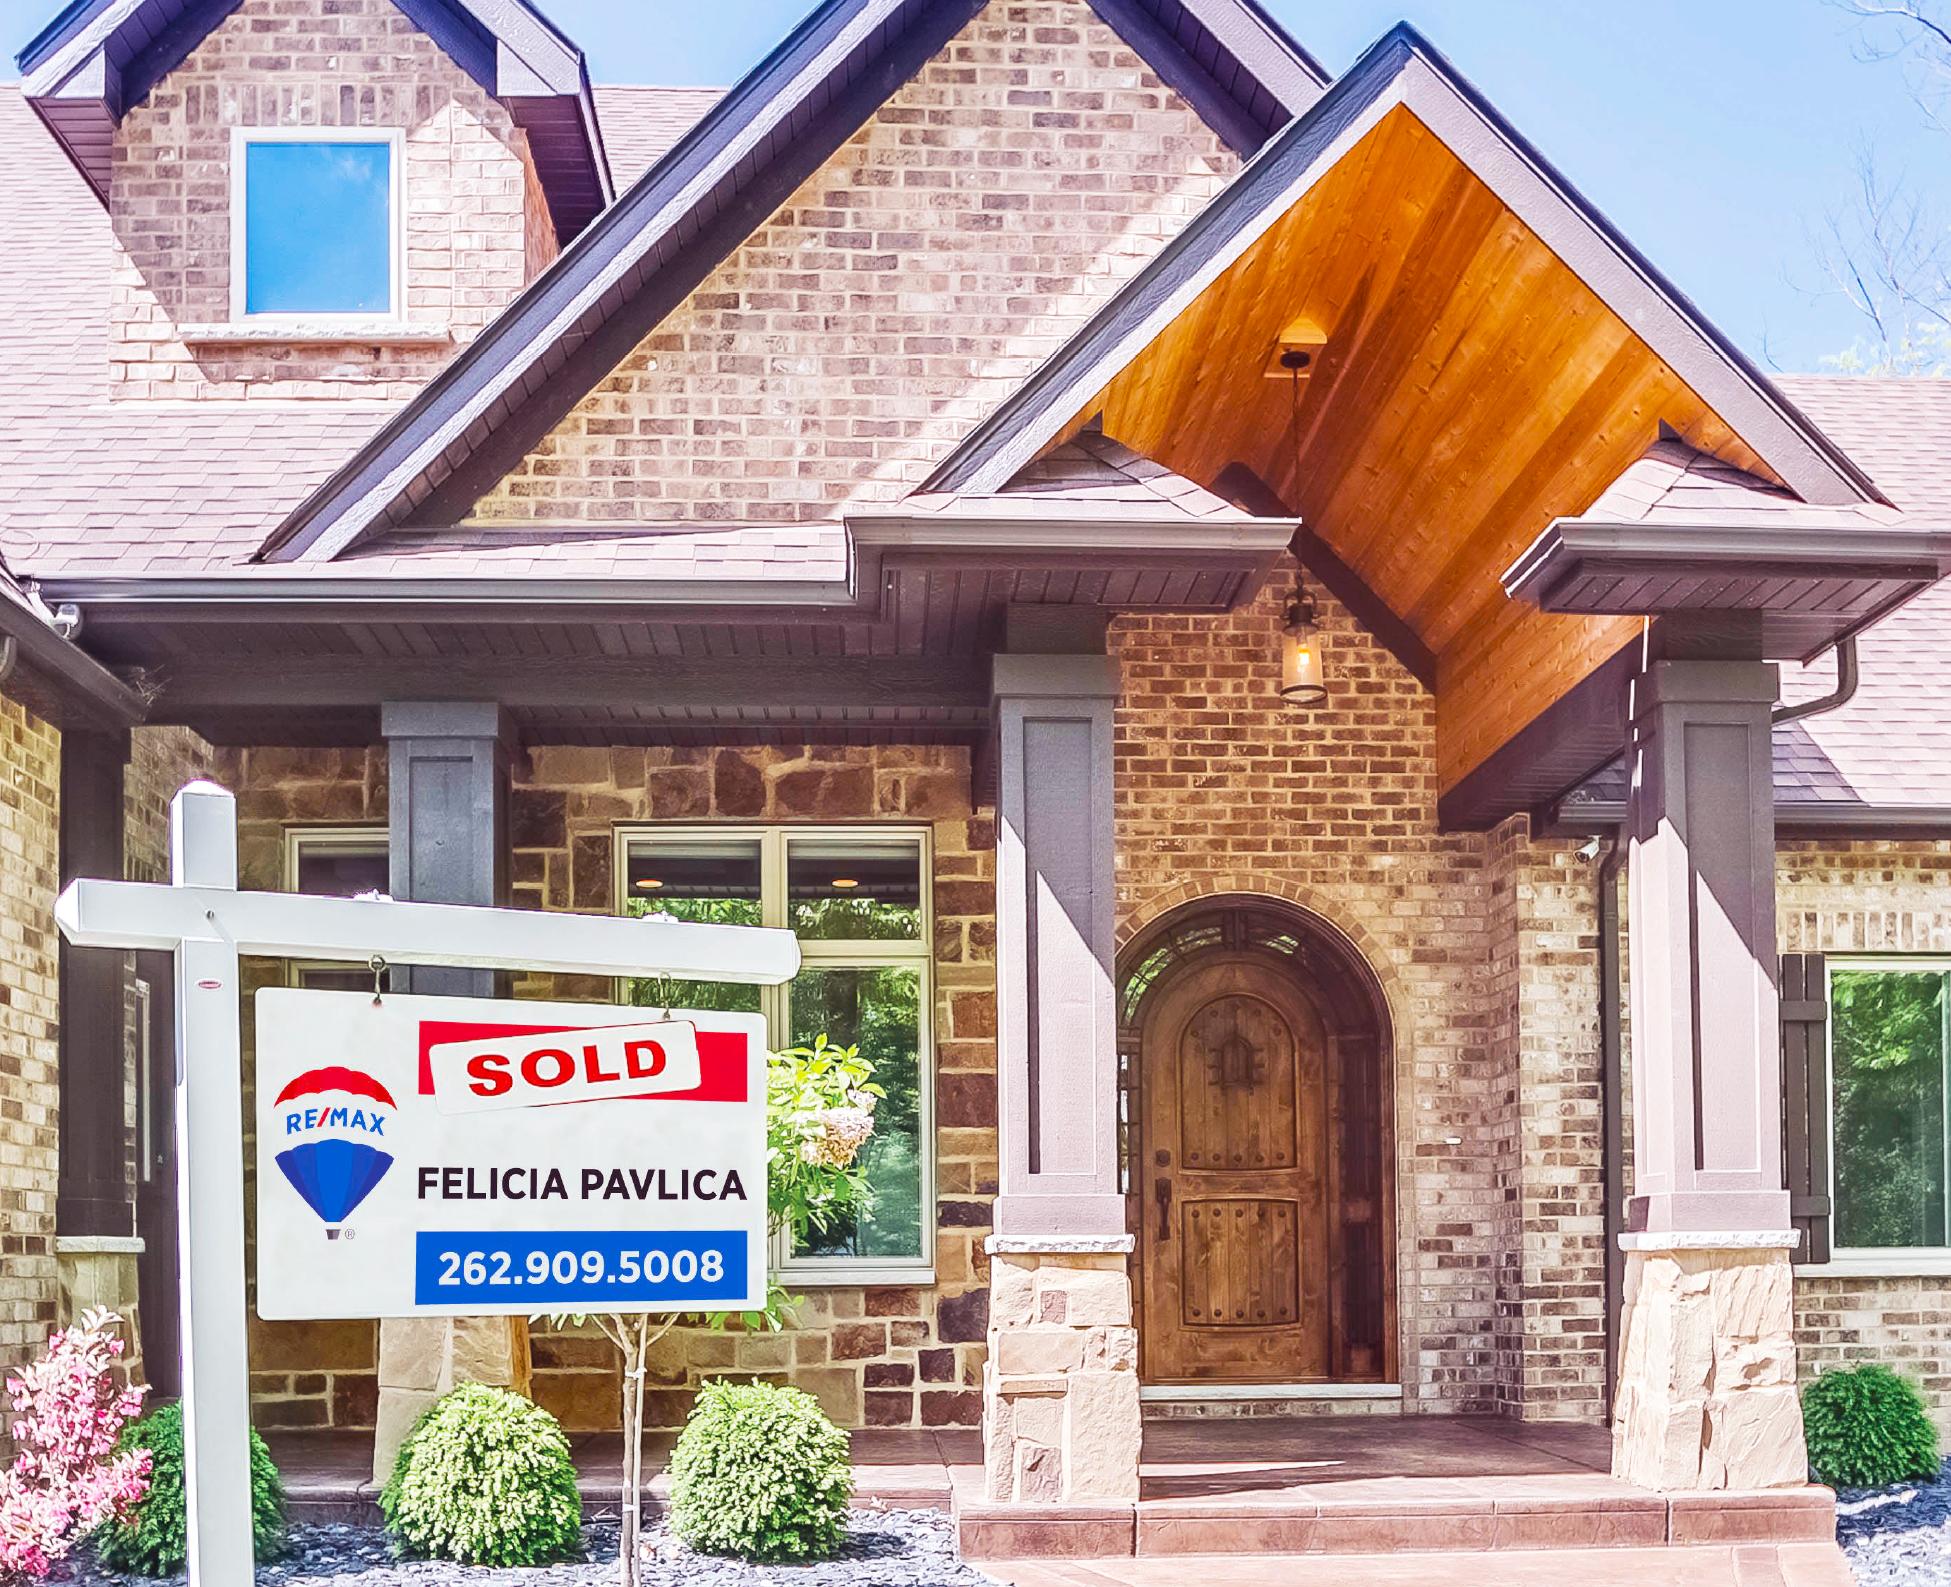 selling a house in racine, realtors in racine, racine area house selling